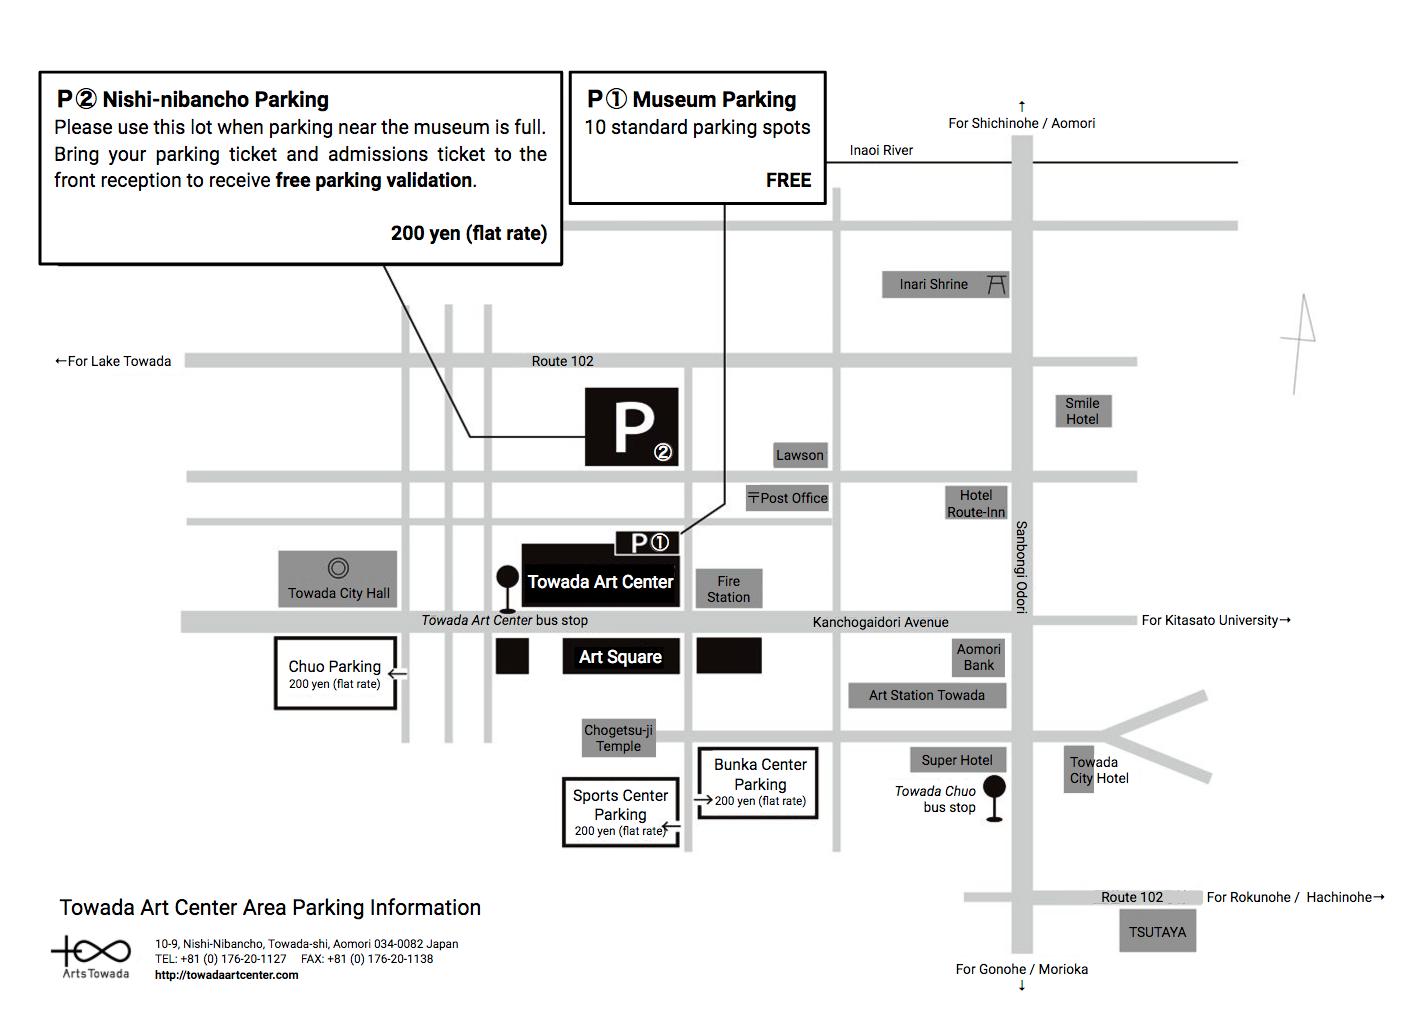 Towada Art Center Area Parking Information